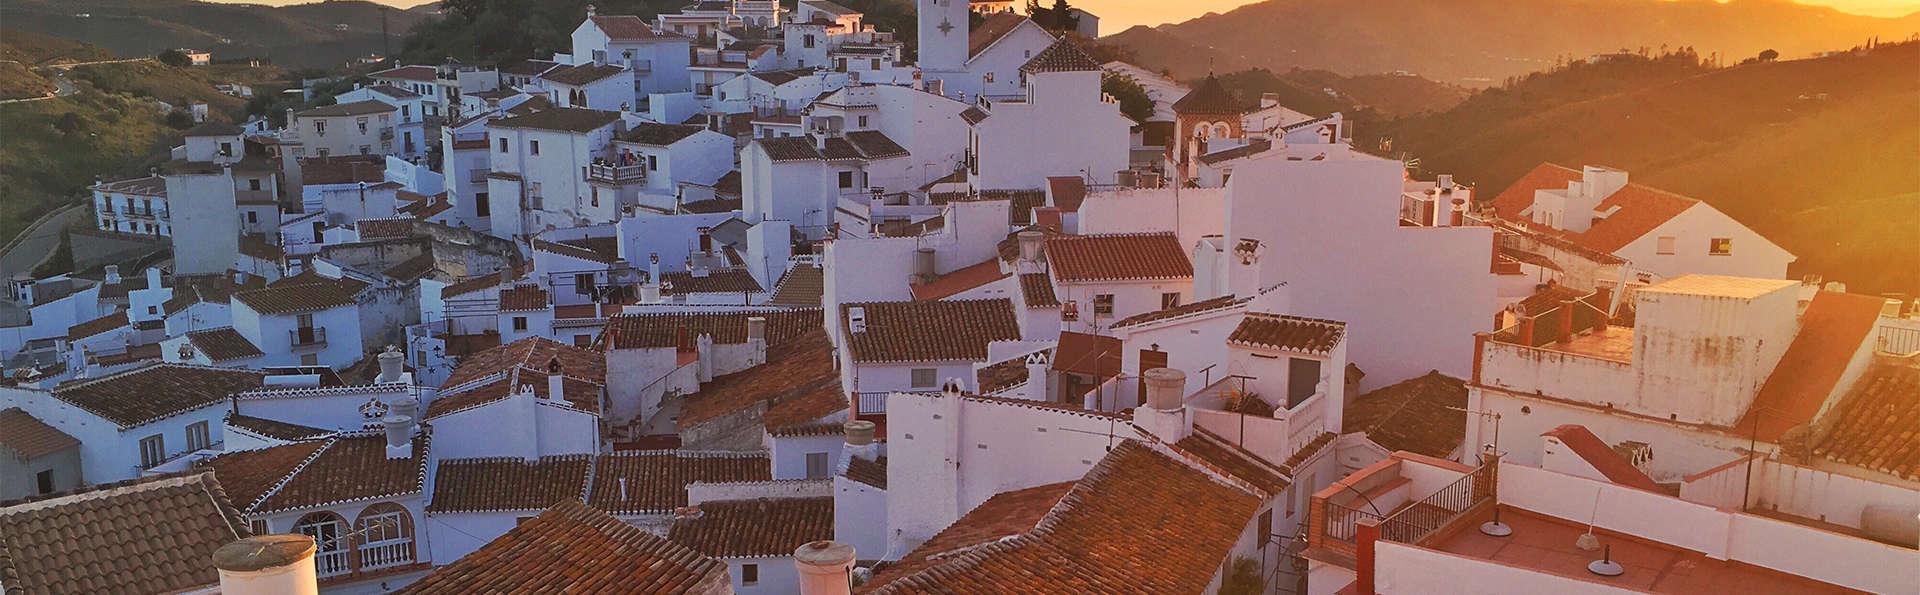 Hotel Zenit Málaga - EDIT_Destination_Malaga2.jpg